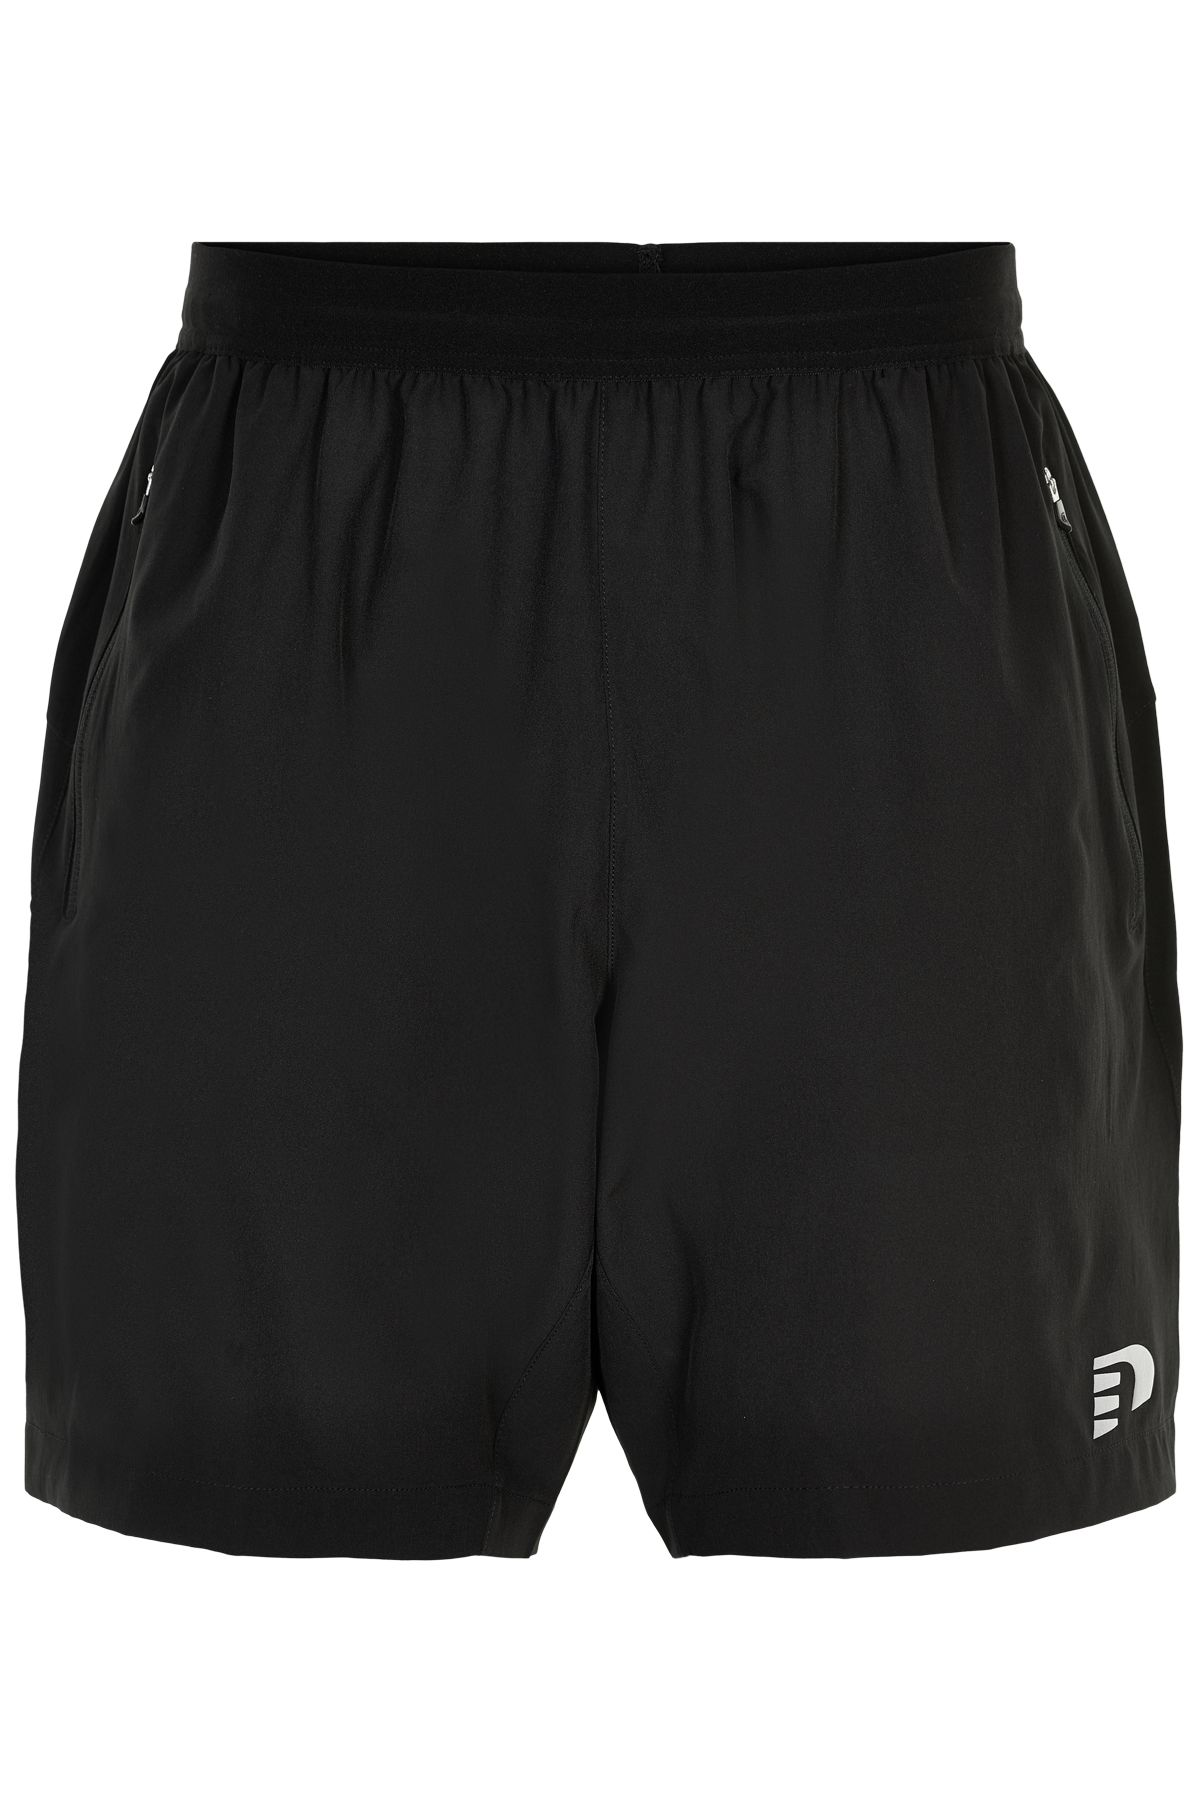 Newline Baggy Shorts (Black)